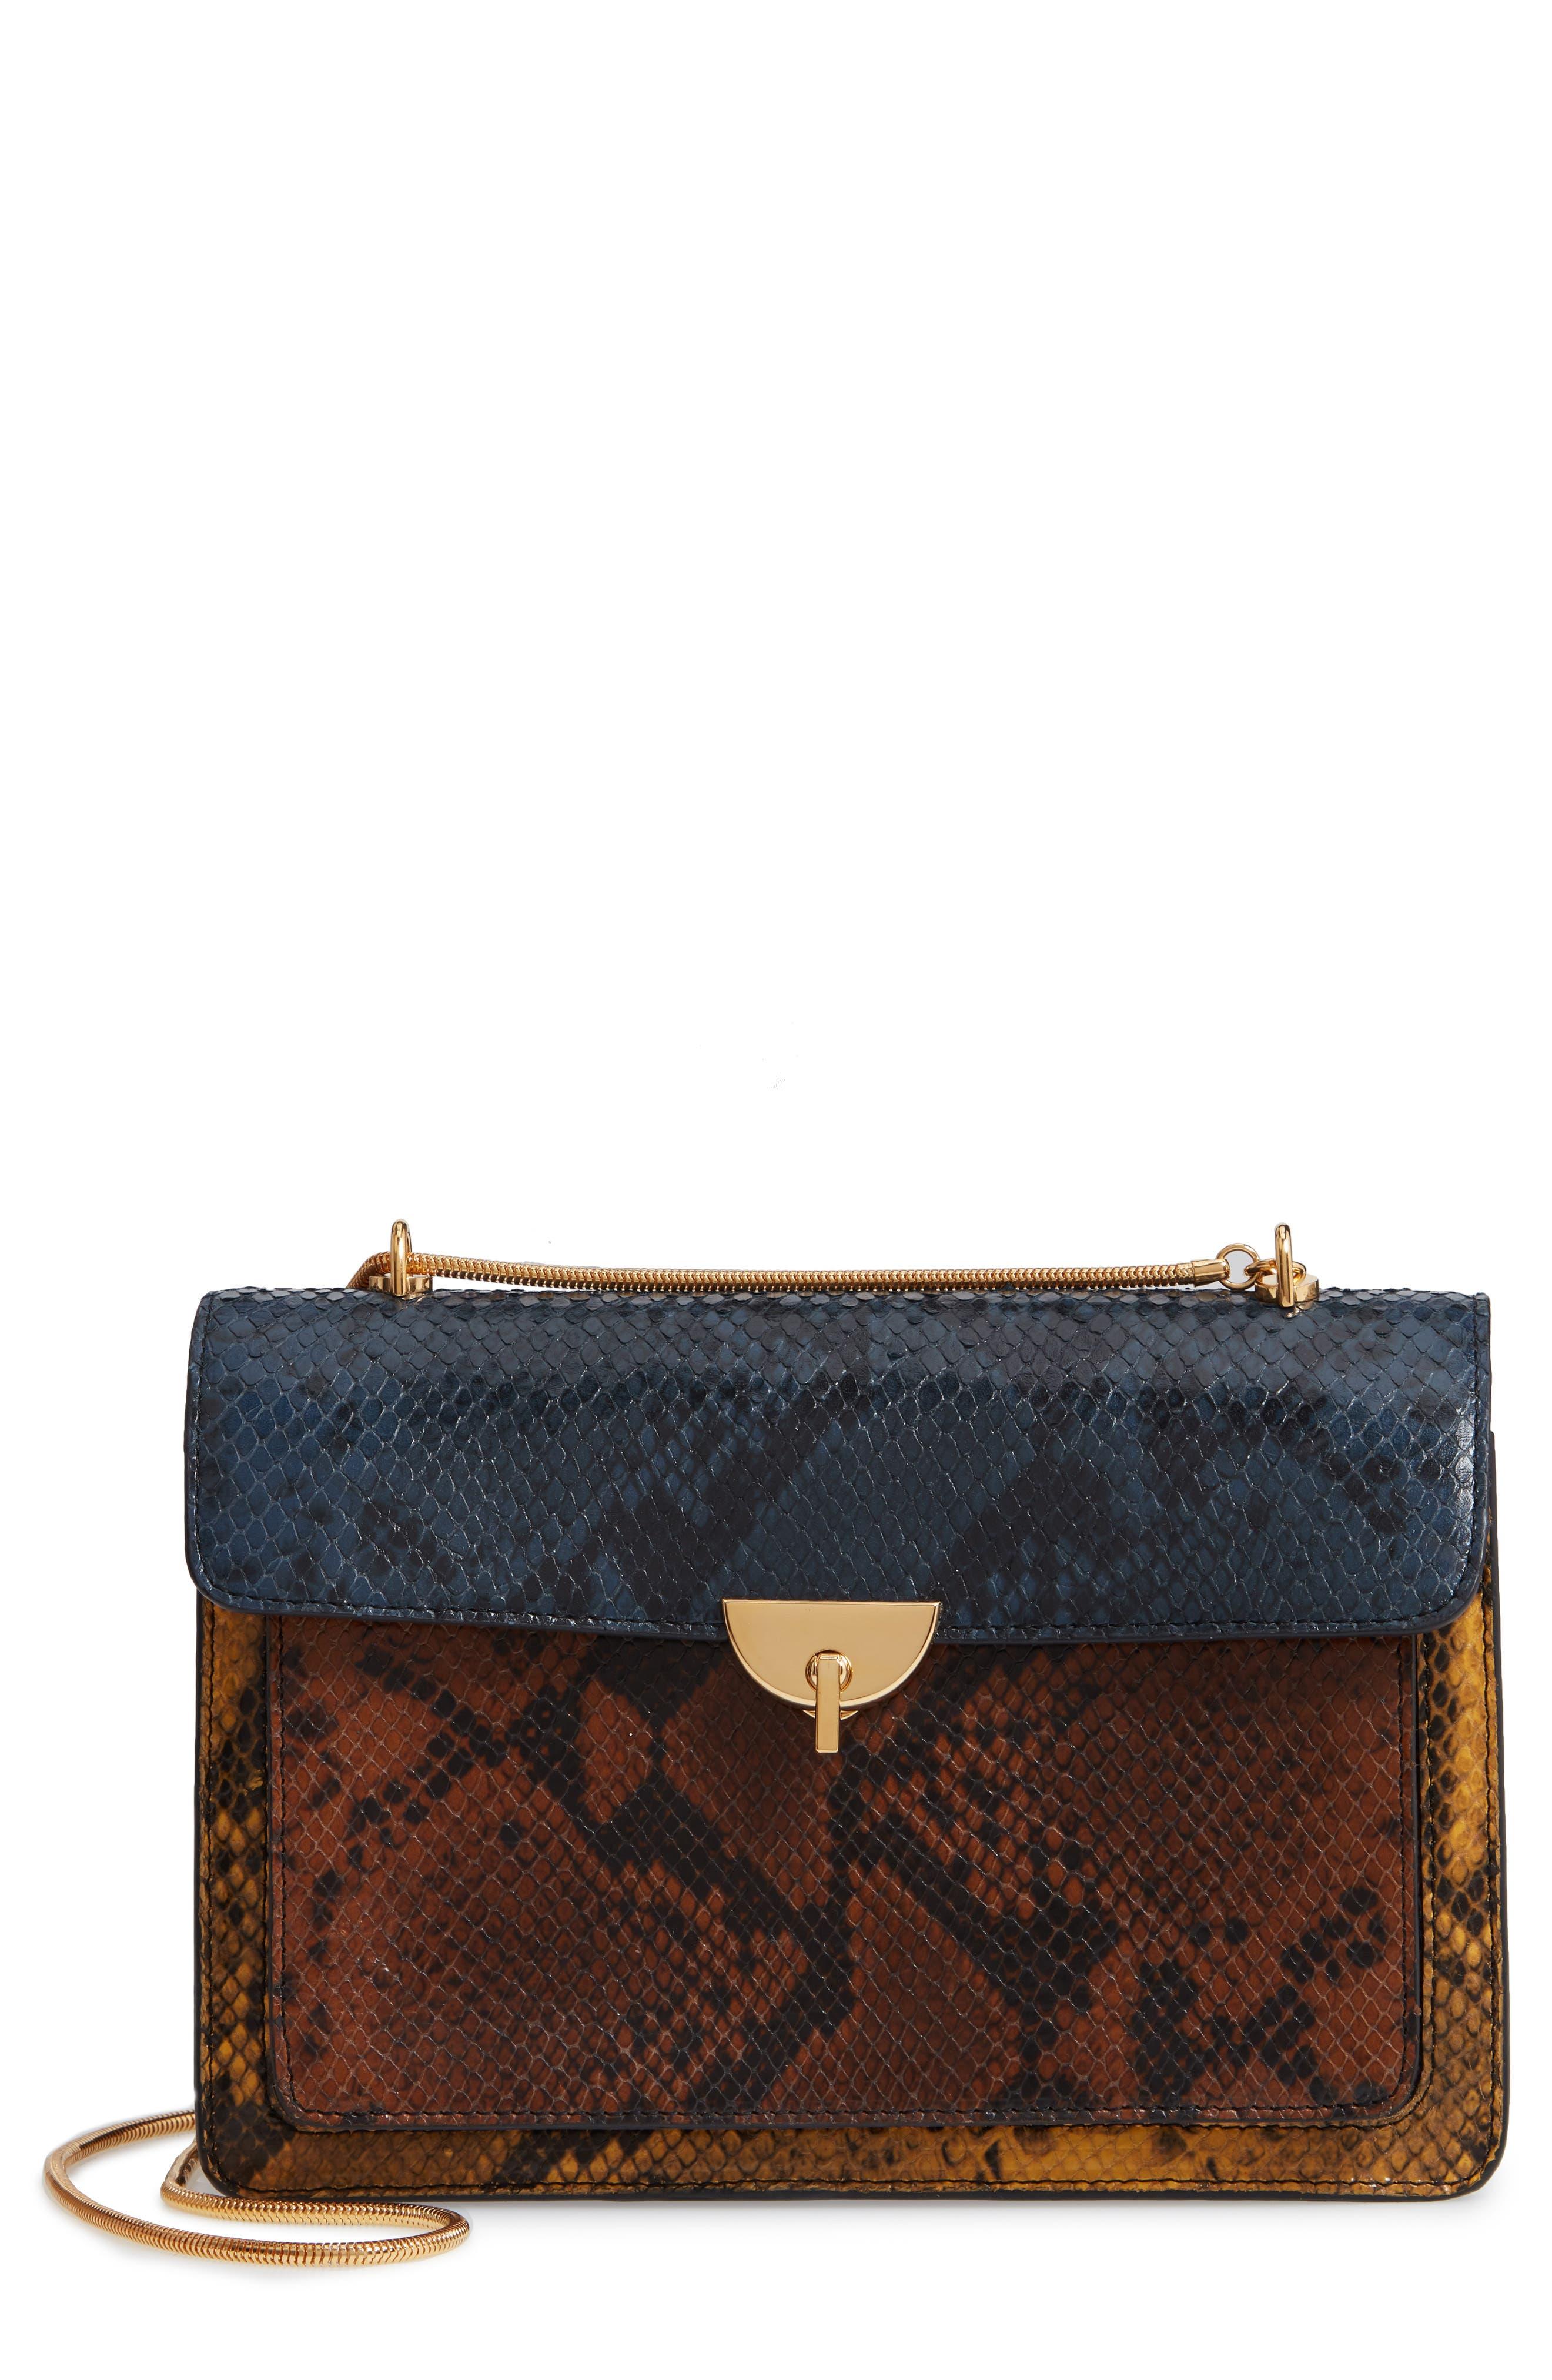 Croc Embossed Leather Shoulder Bag,                             Main thumbnail 1, color,                             200